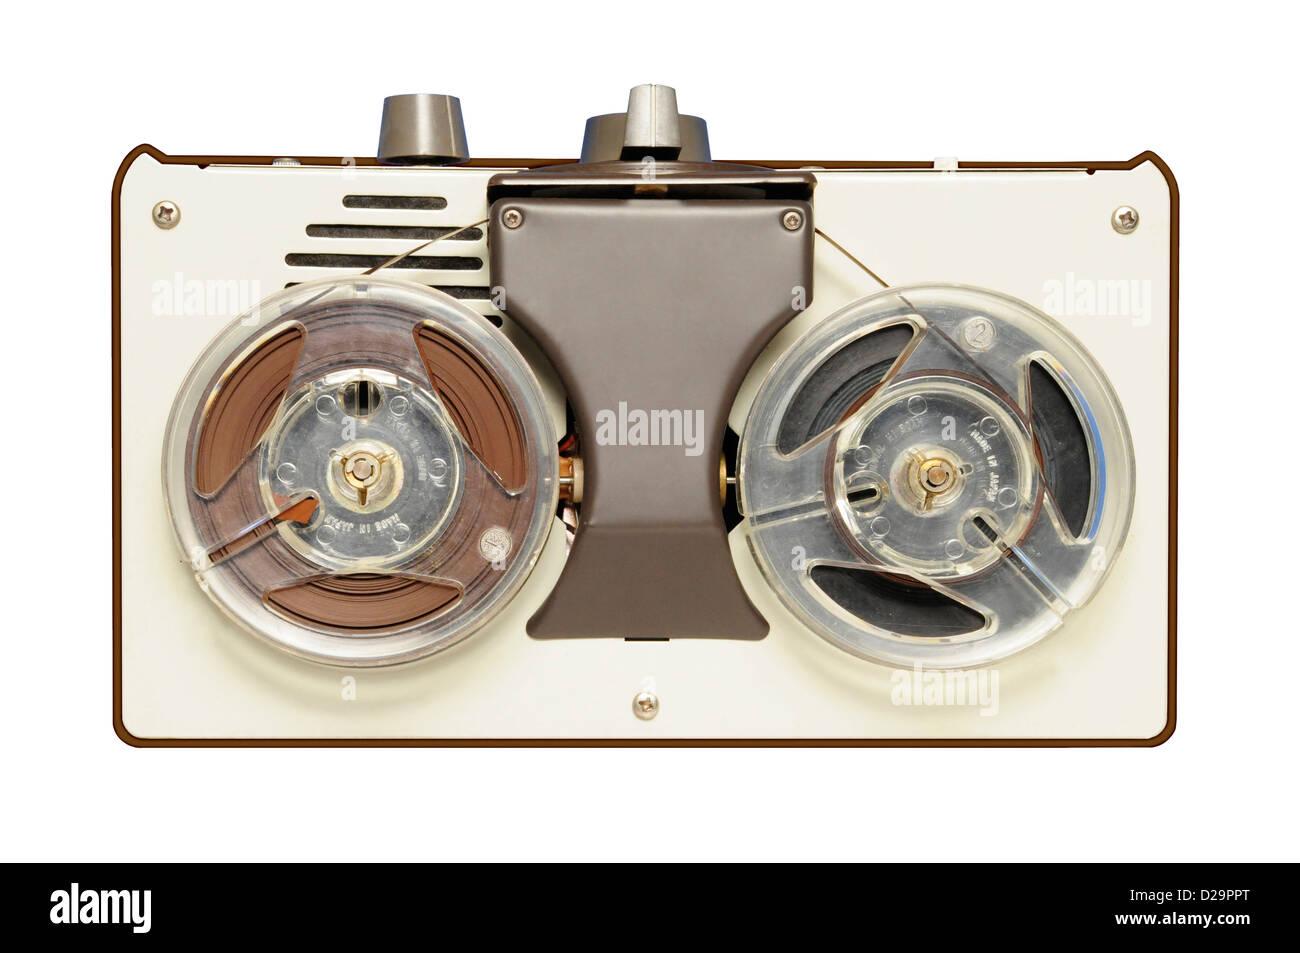 Vintage reel-to-reel tape recorder - Stock Image